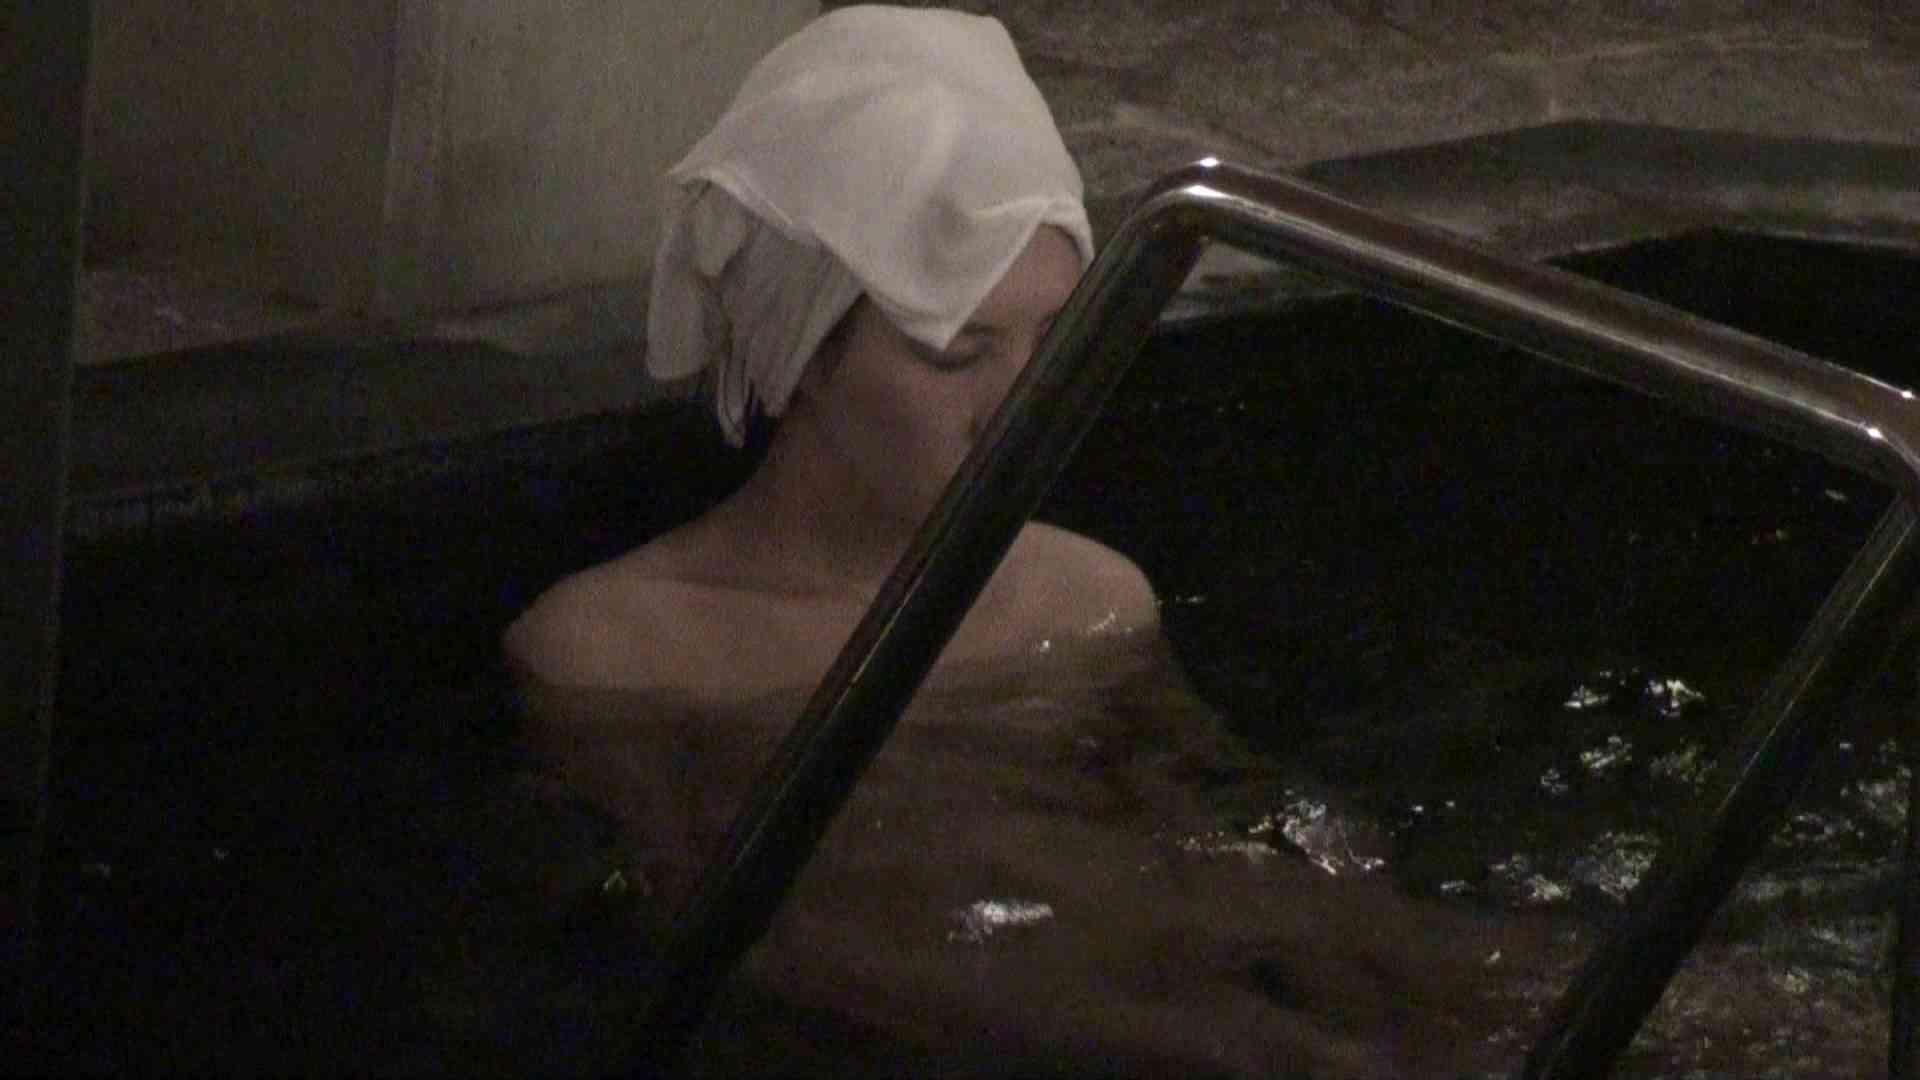 Aquaな露天風呂Vol.358 盗撮シリーズ | 露天風呂編  104PIX 5